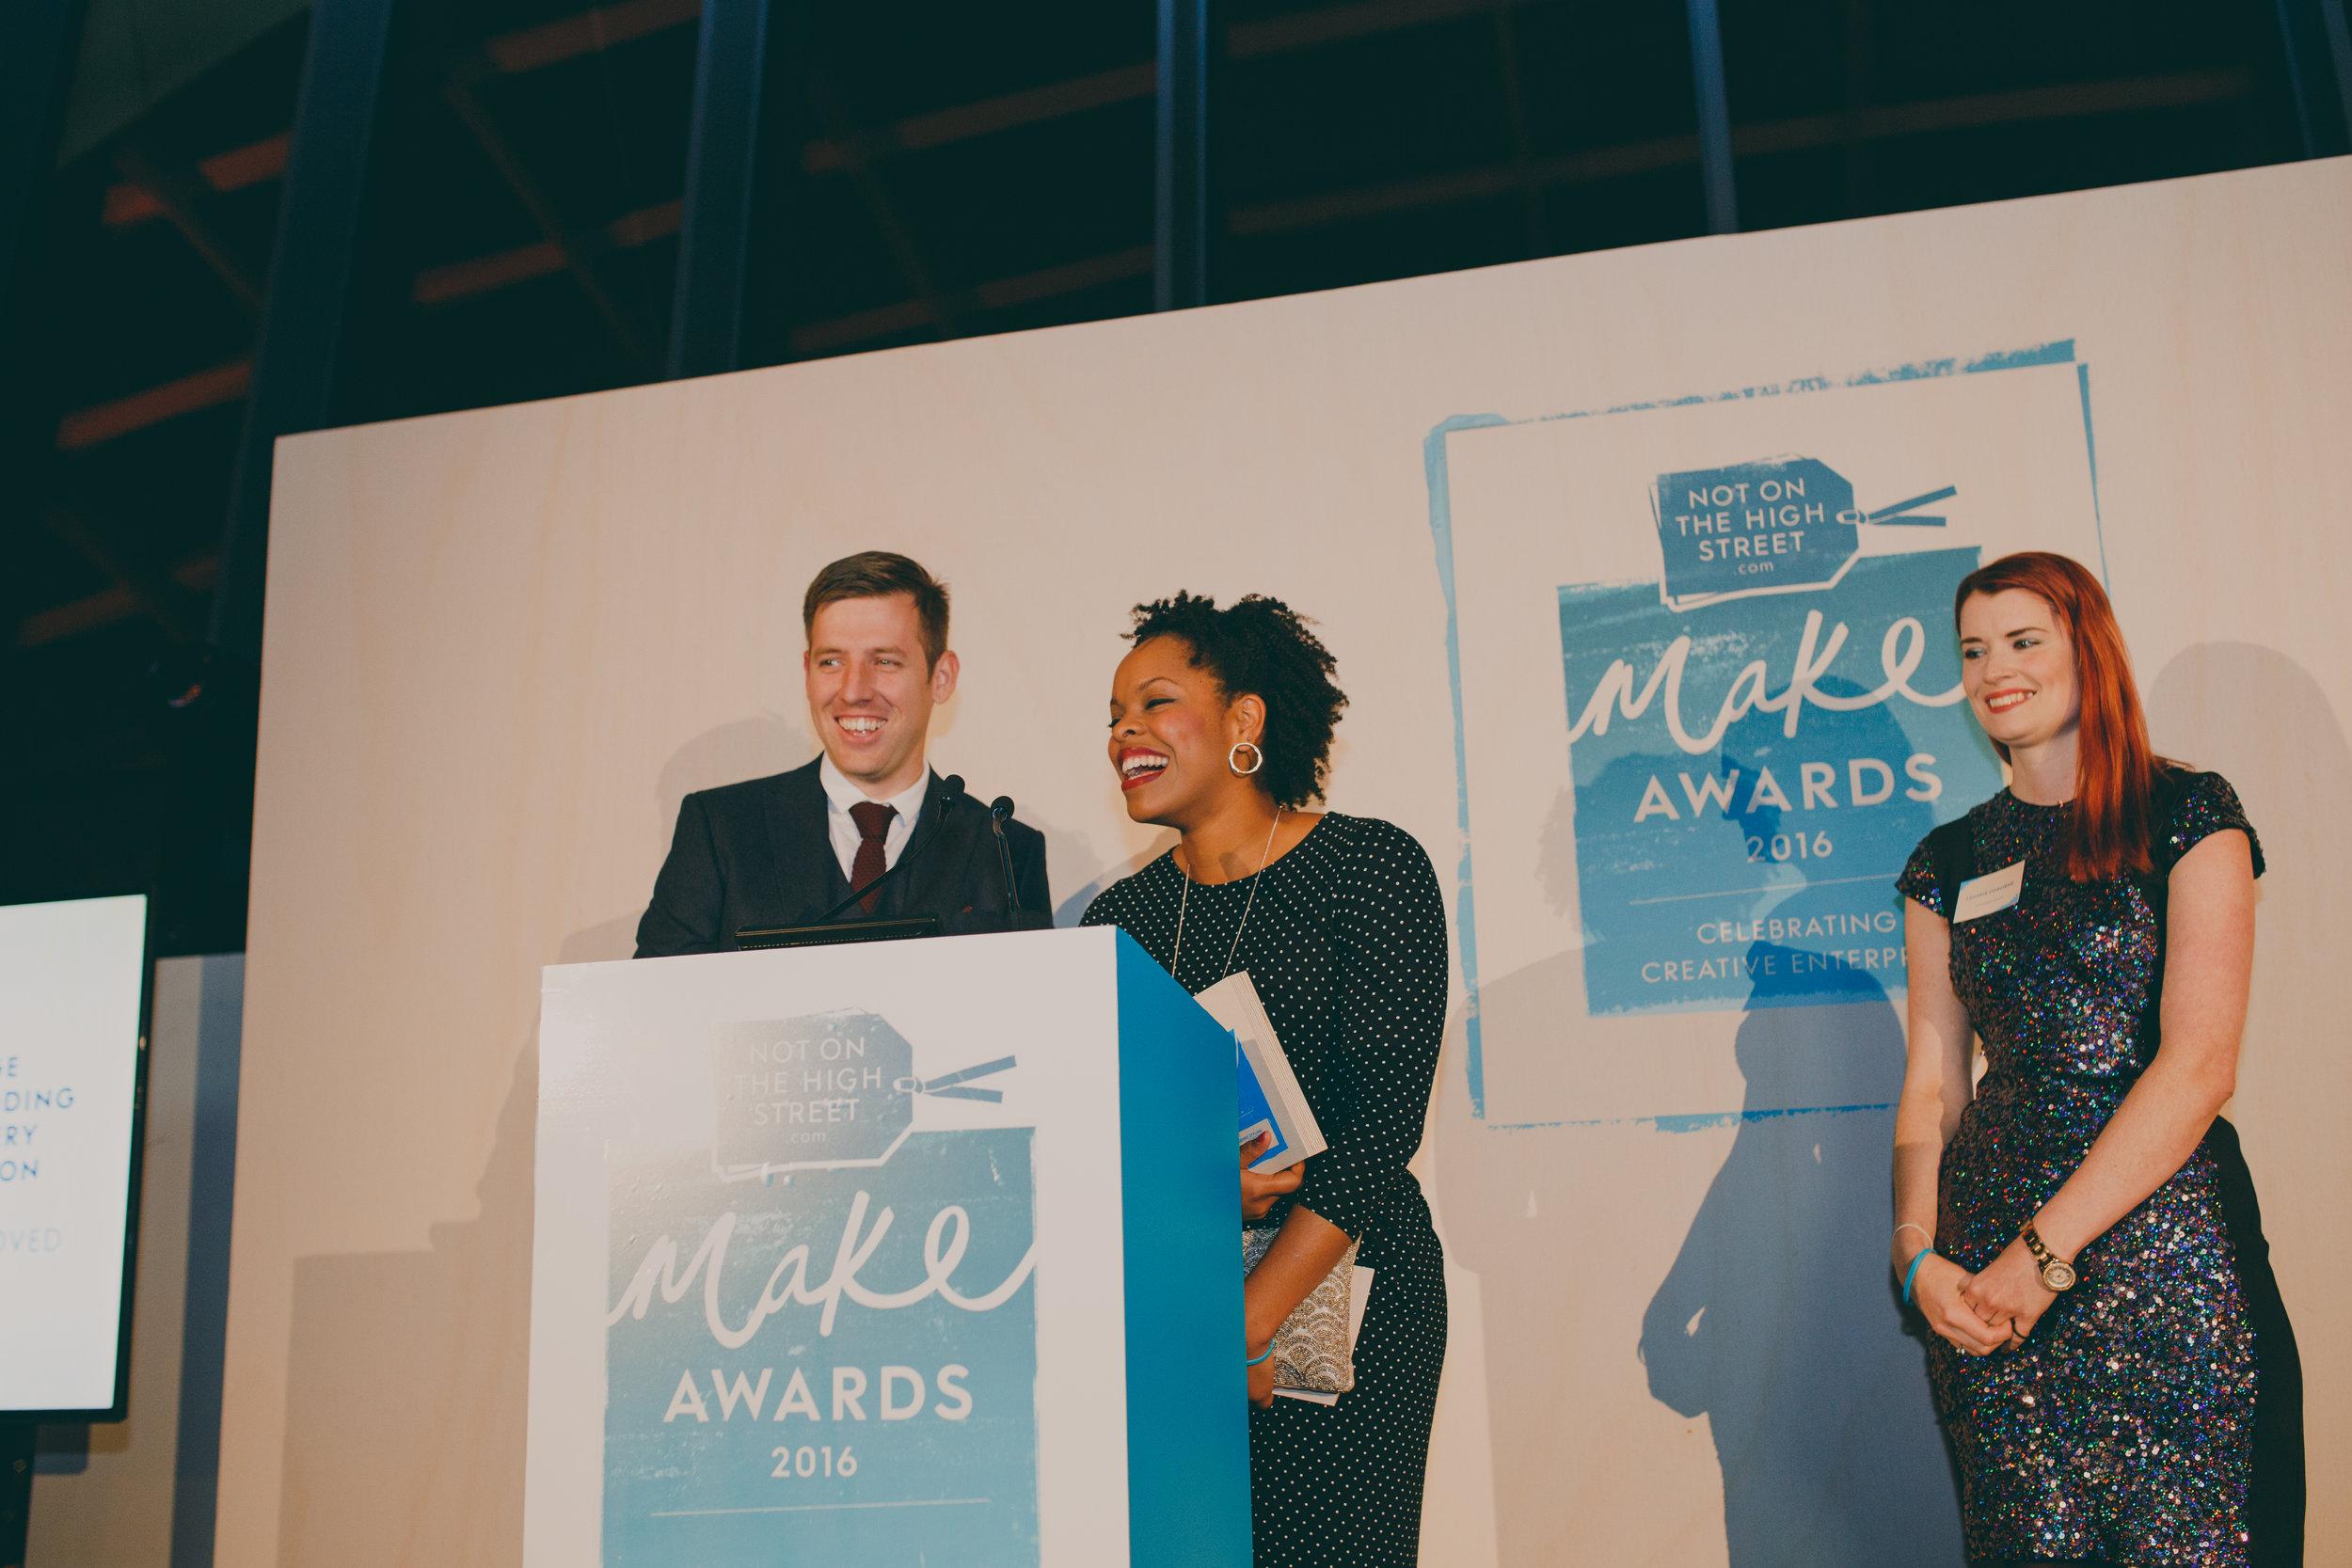 dearly-beloved-award-winning-wedding-stationery-make-awards